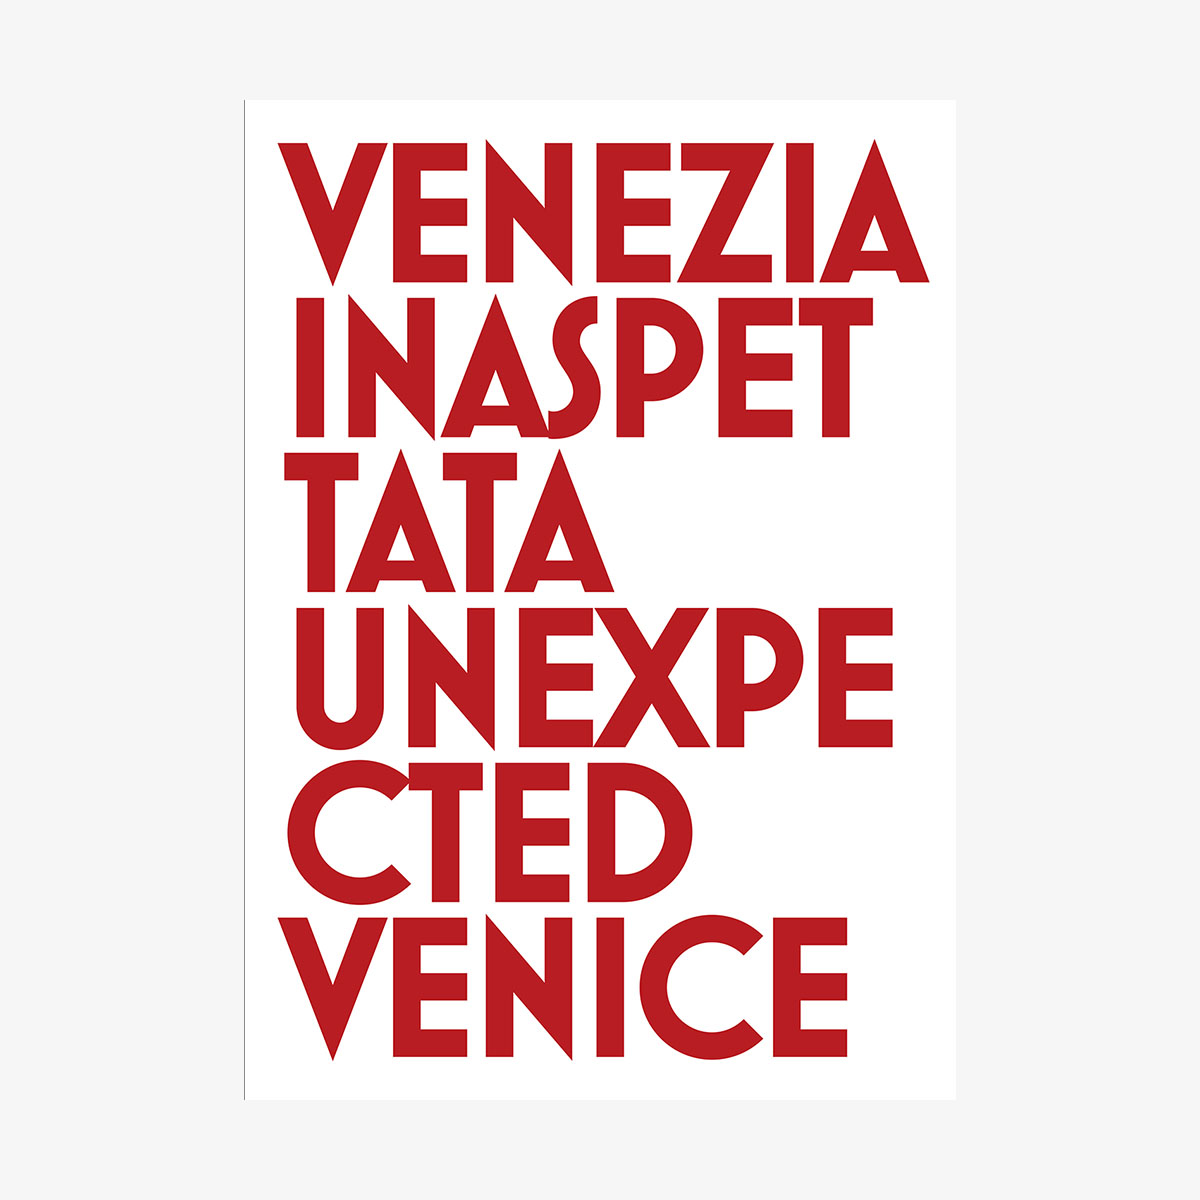 venezia-inaspettata